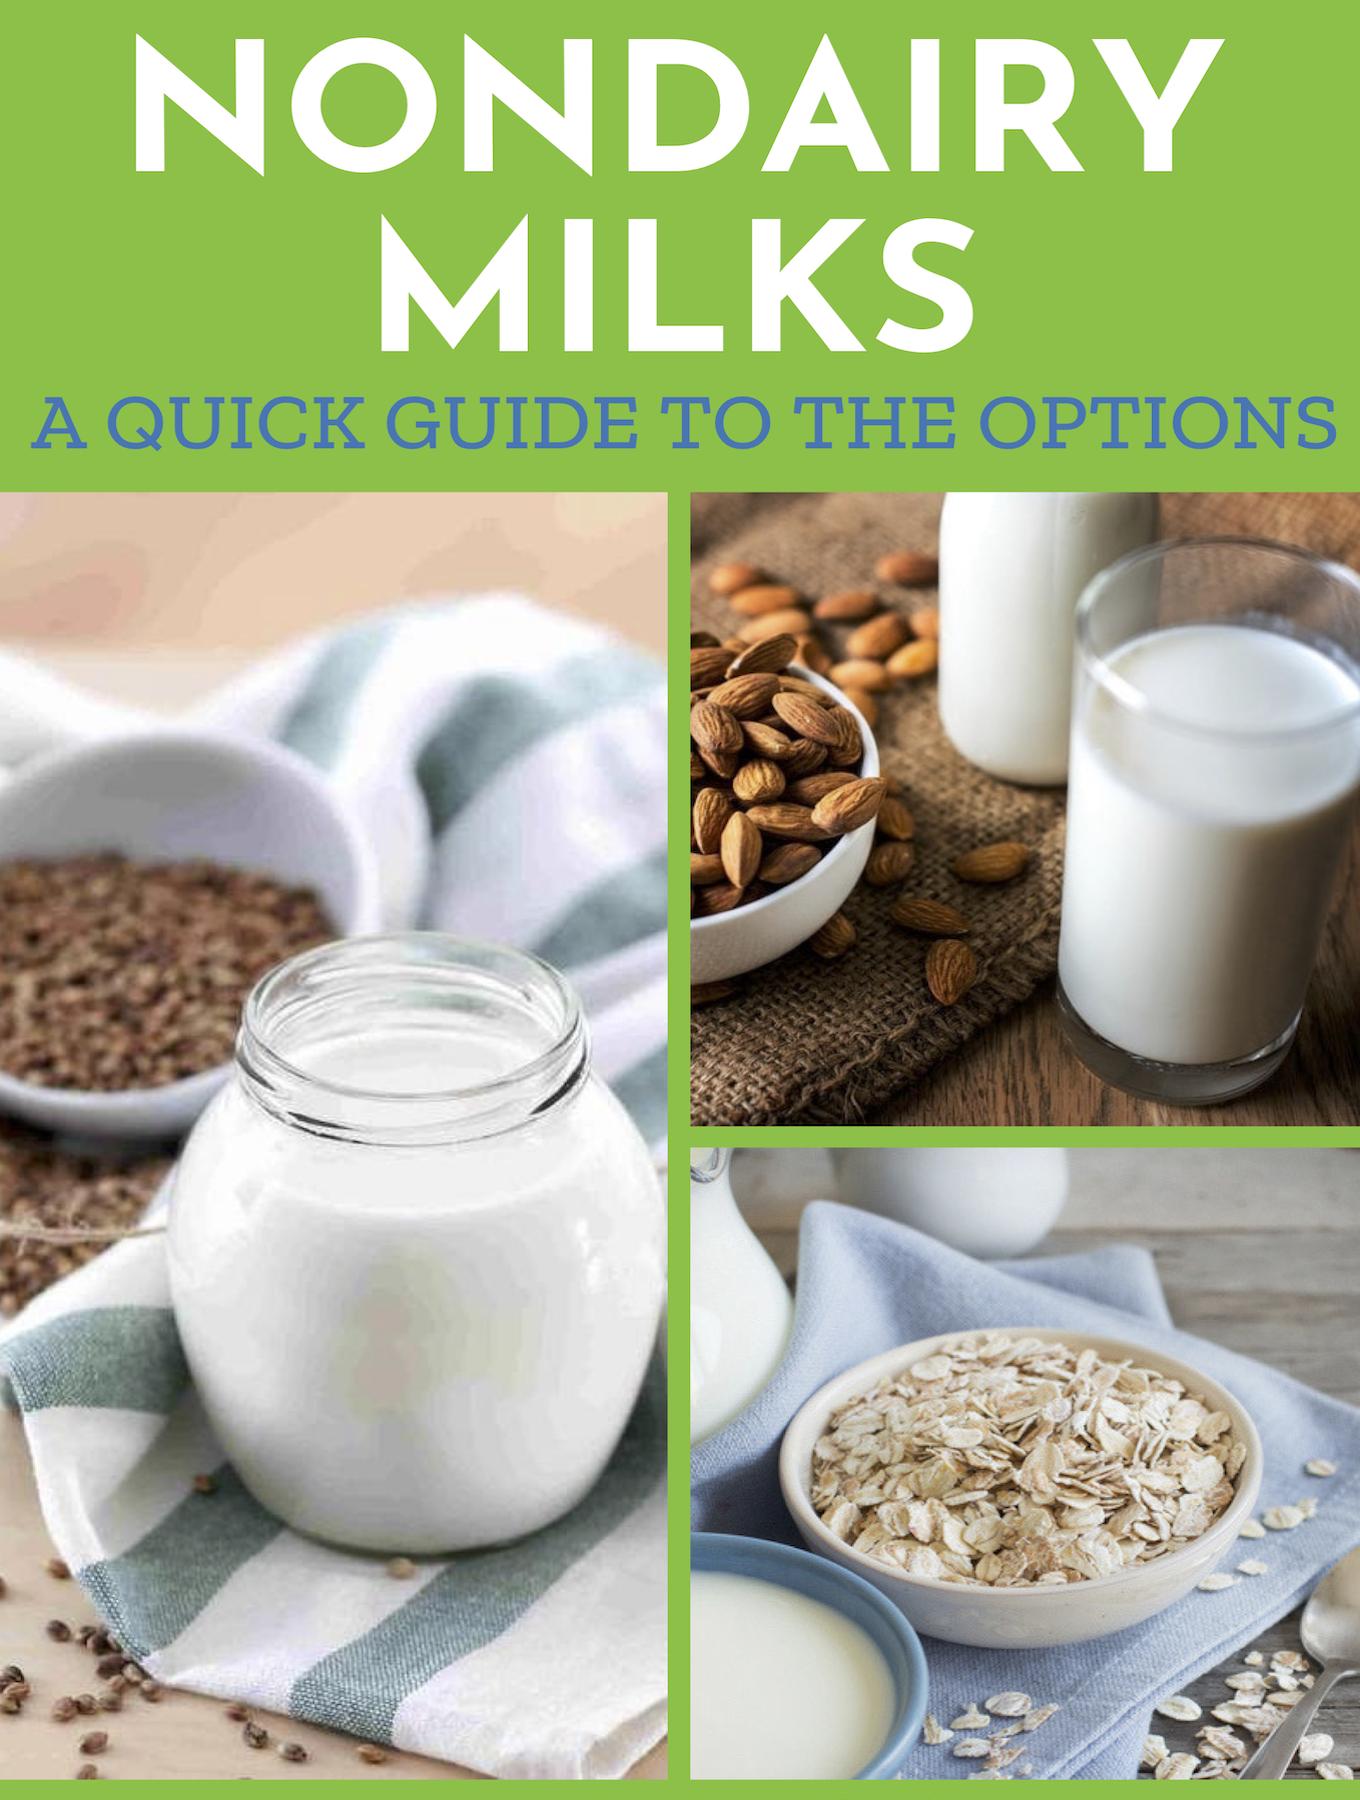 Nondairy plant-based milks